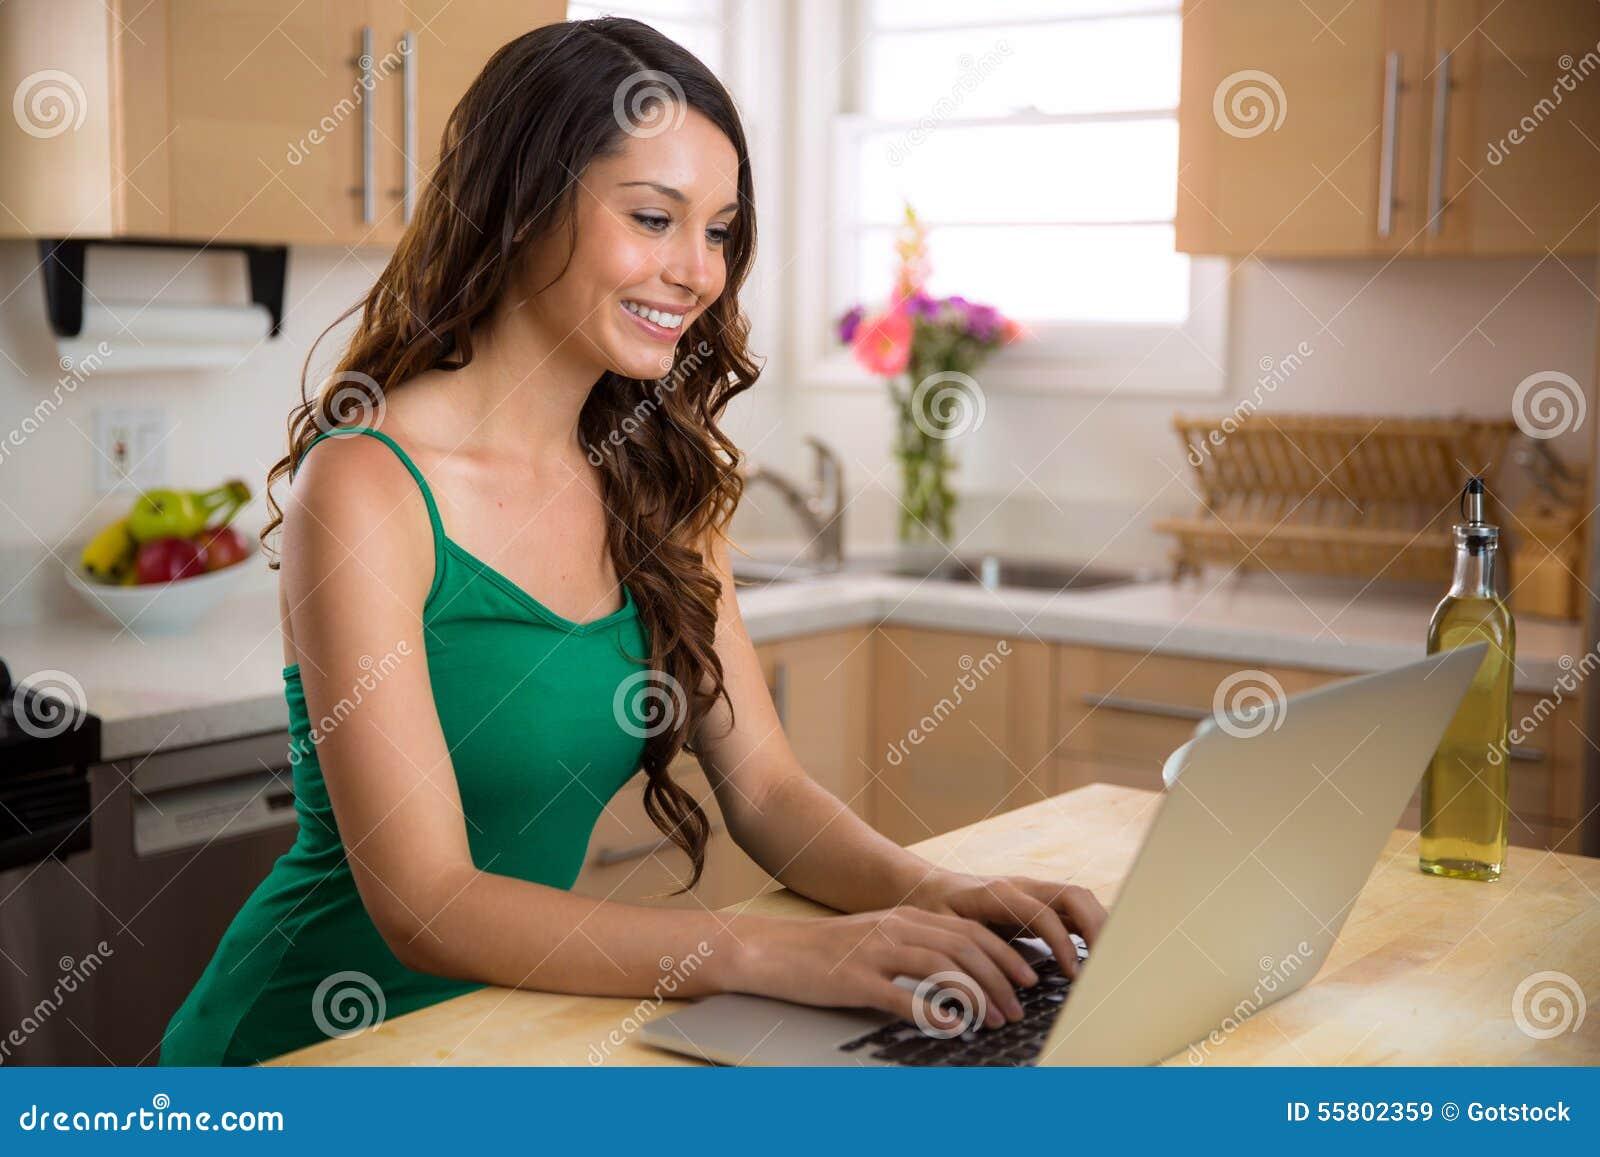 Newcastle KZN dating site